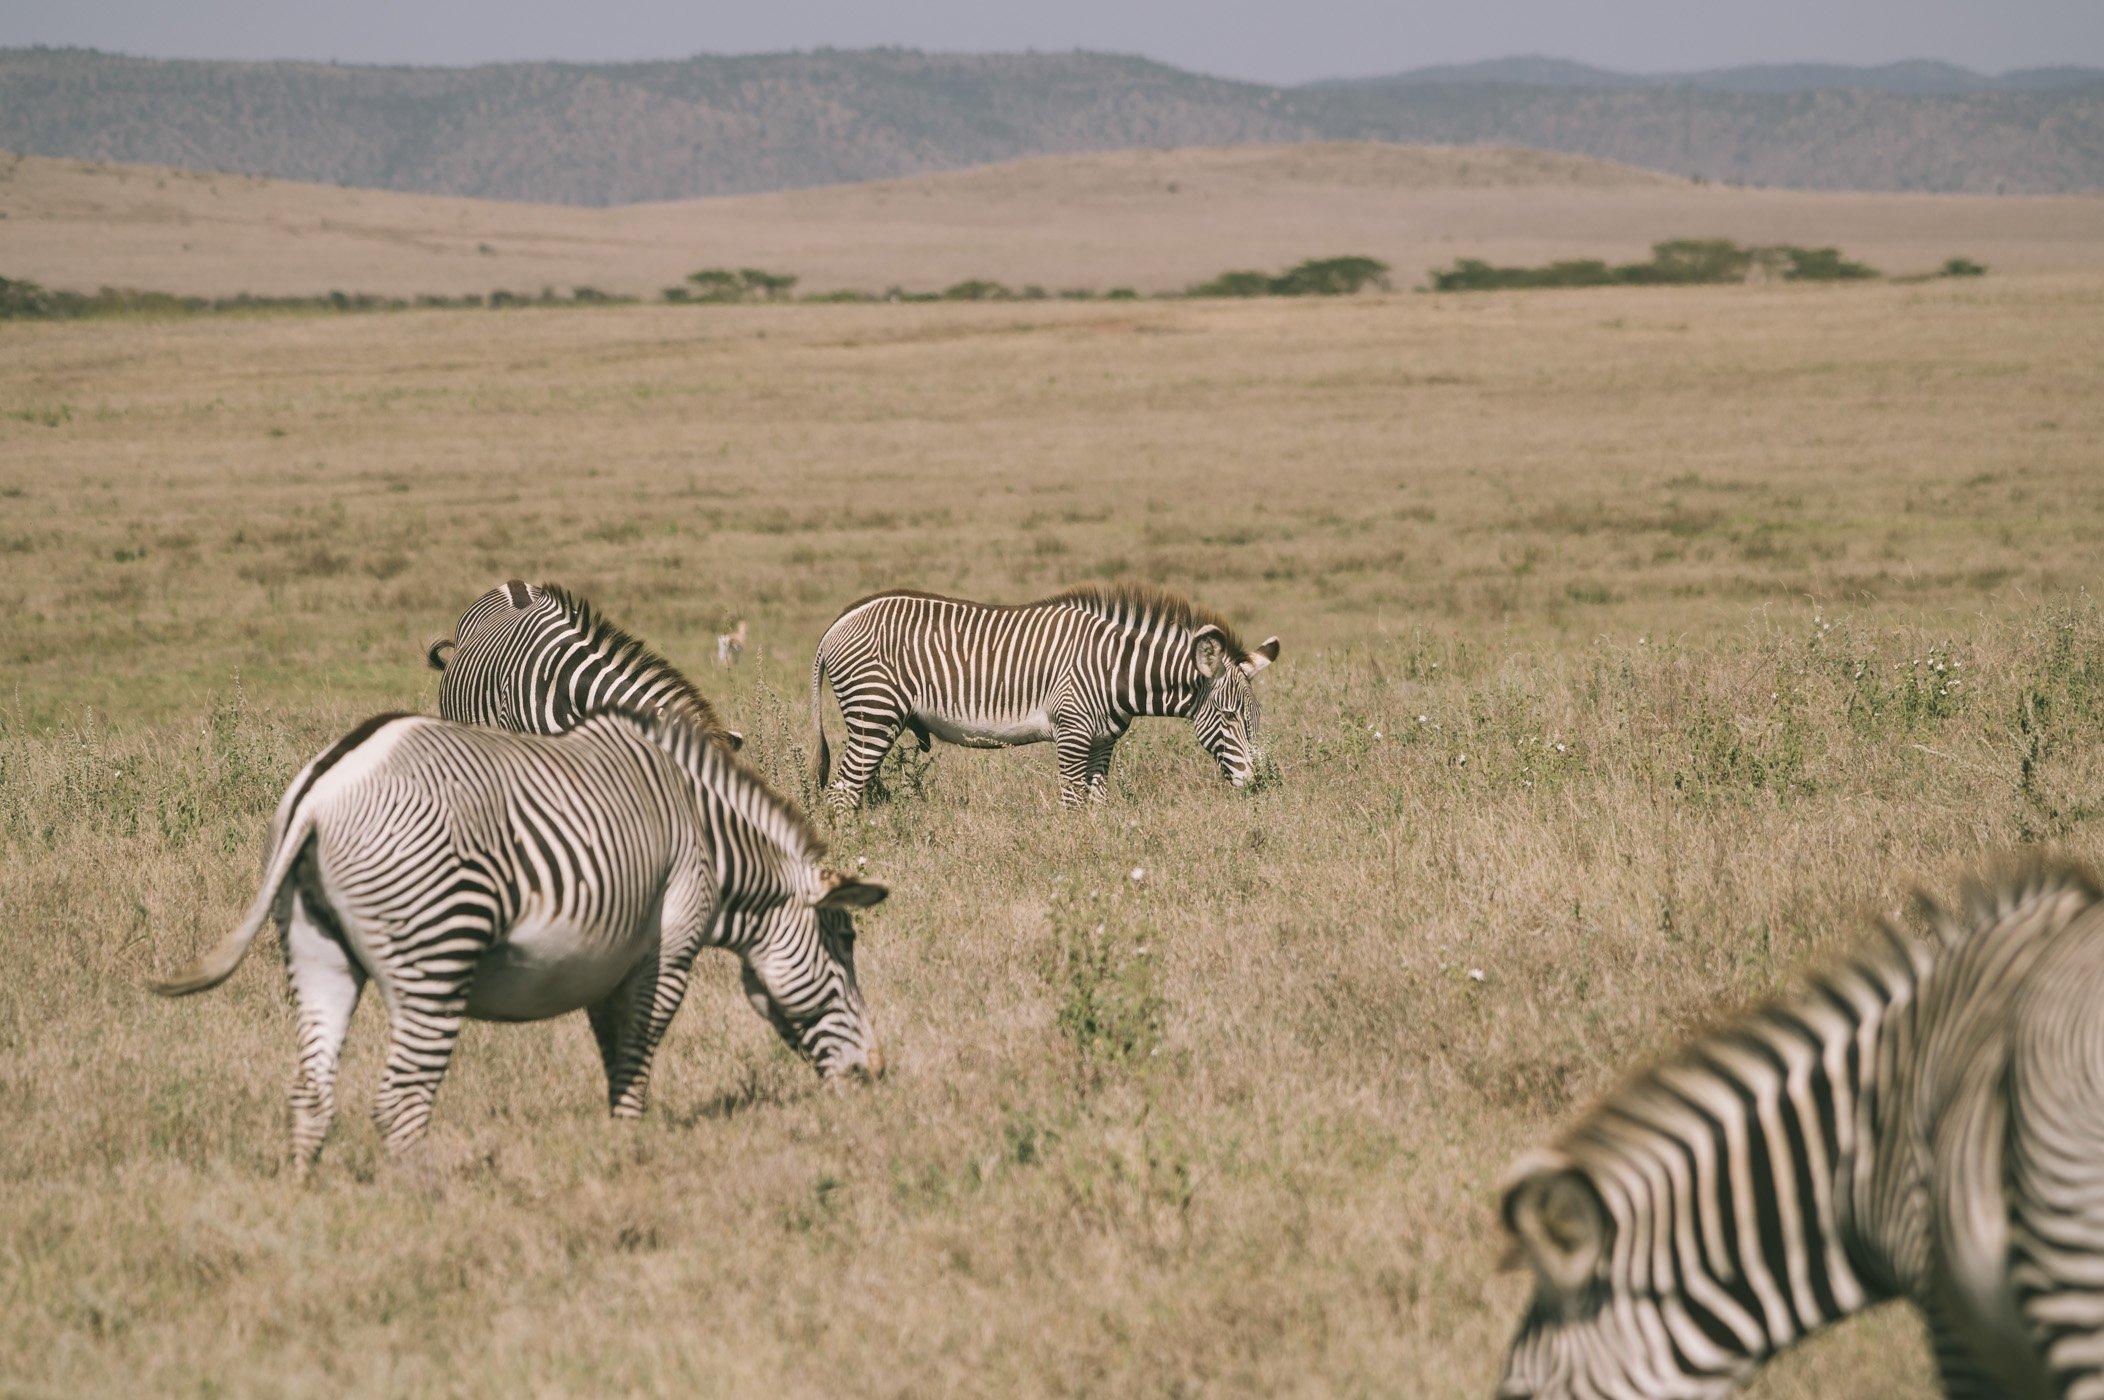 Grevy's Zebras at Lewa Wildlife Conservancy Kenya